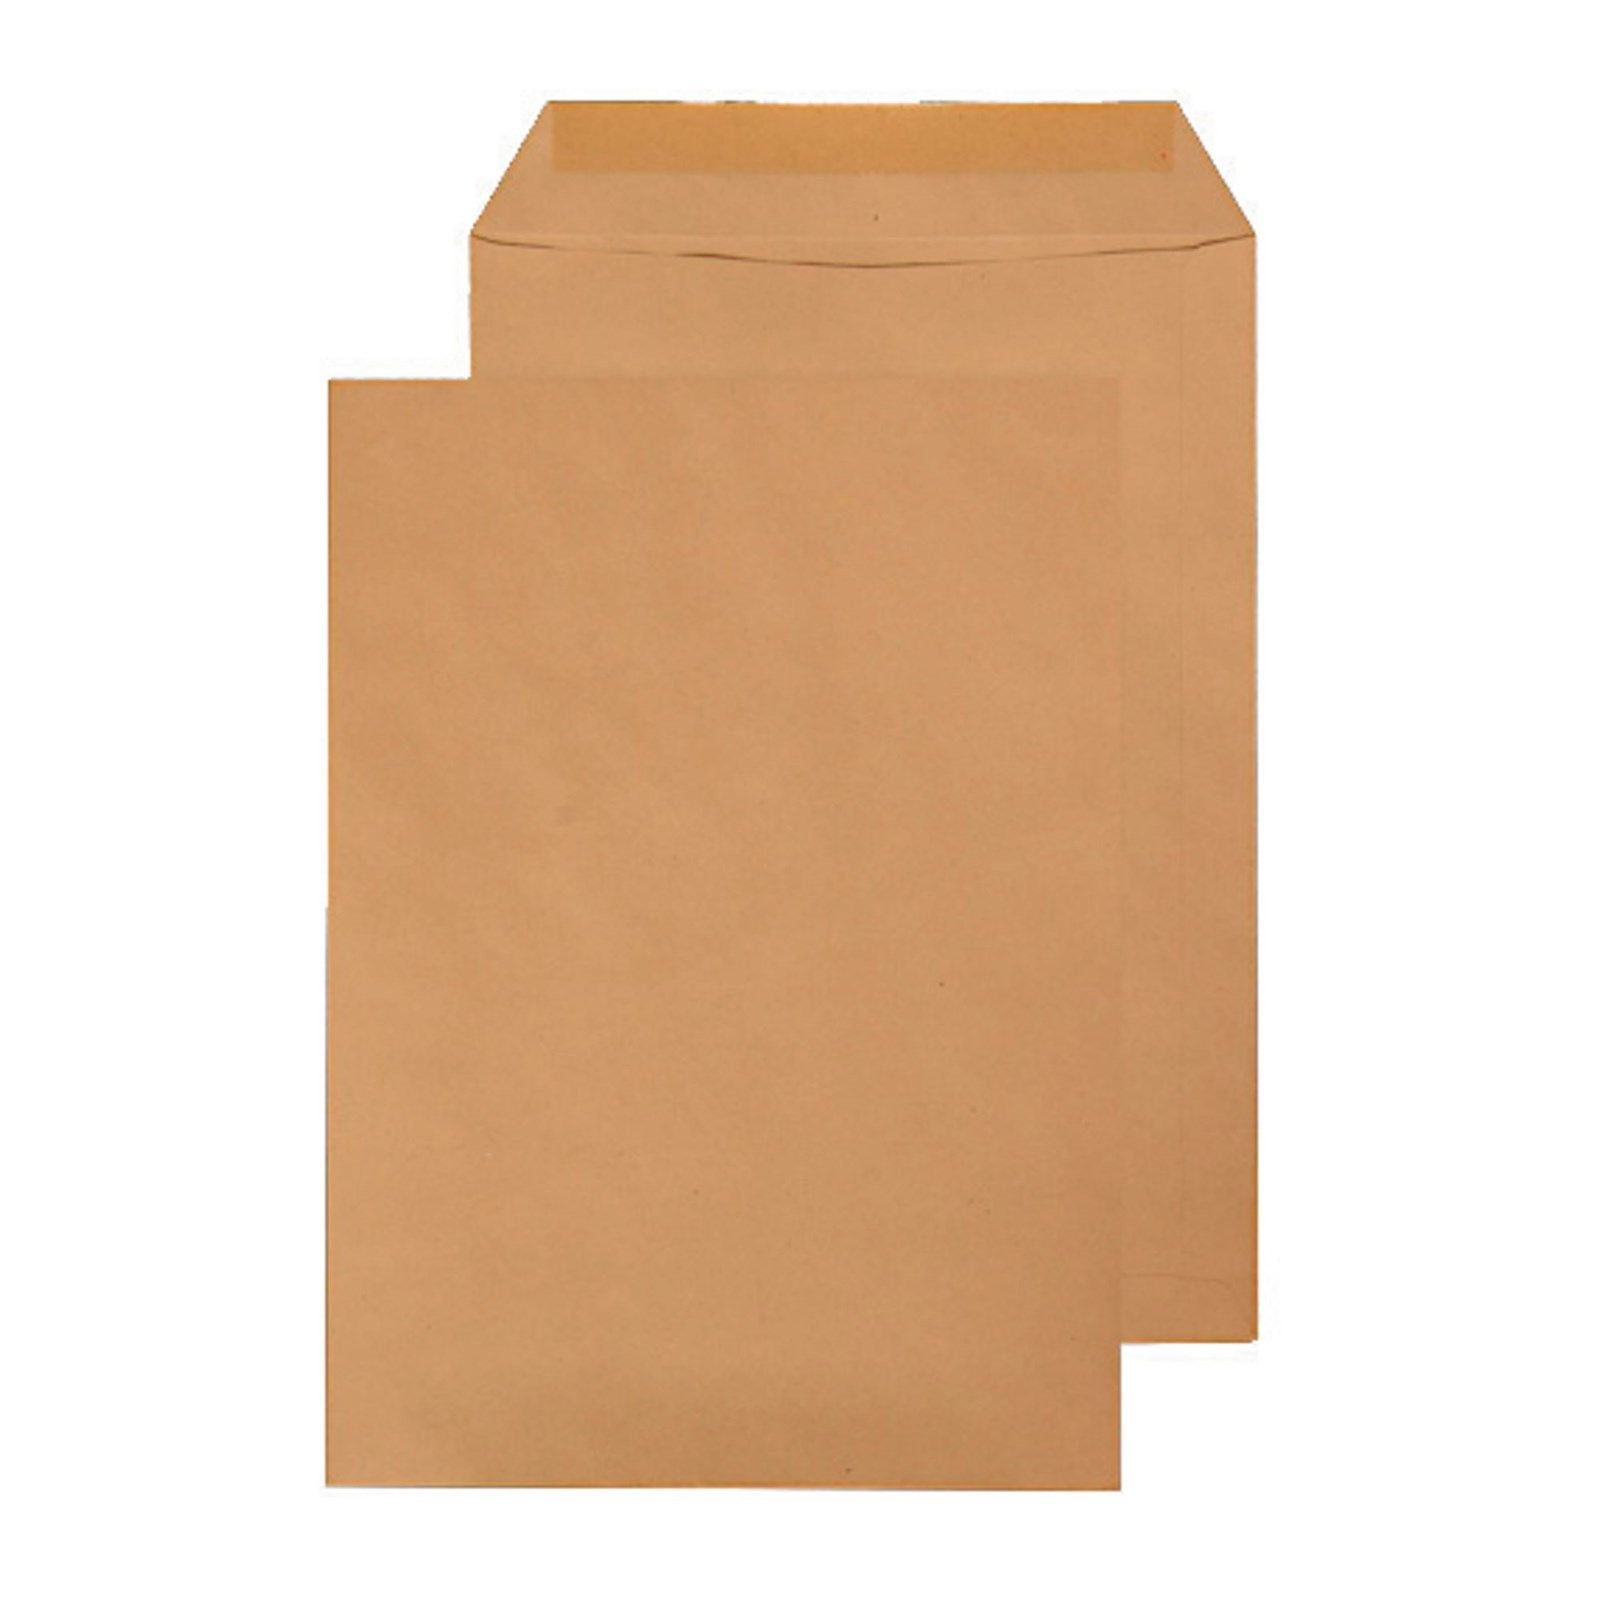 C4 Manilla Gummed Pocket Envelopes - Pack of 25